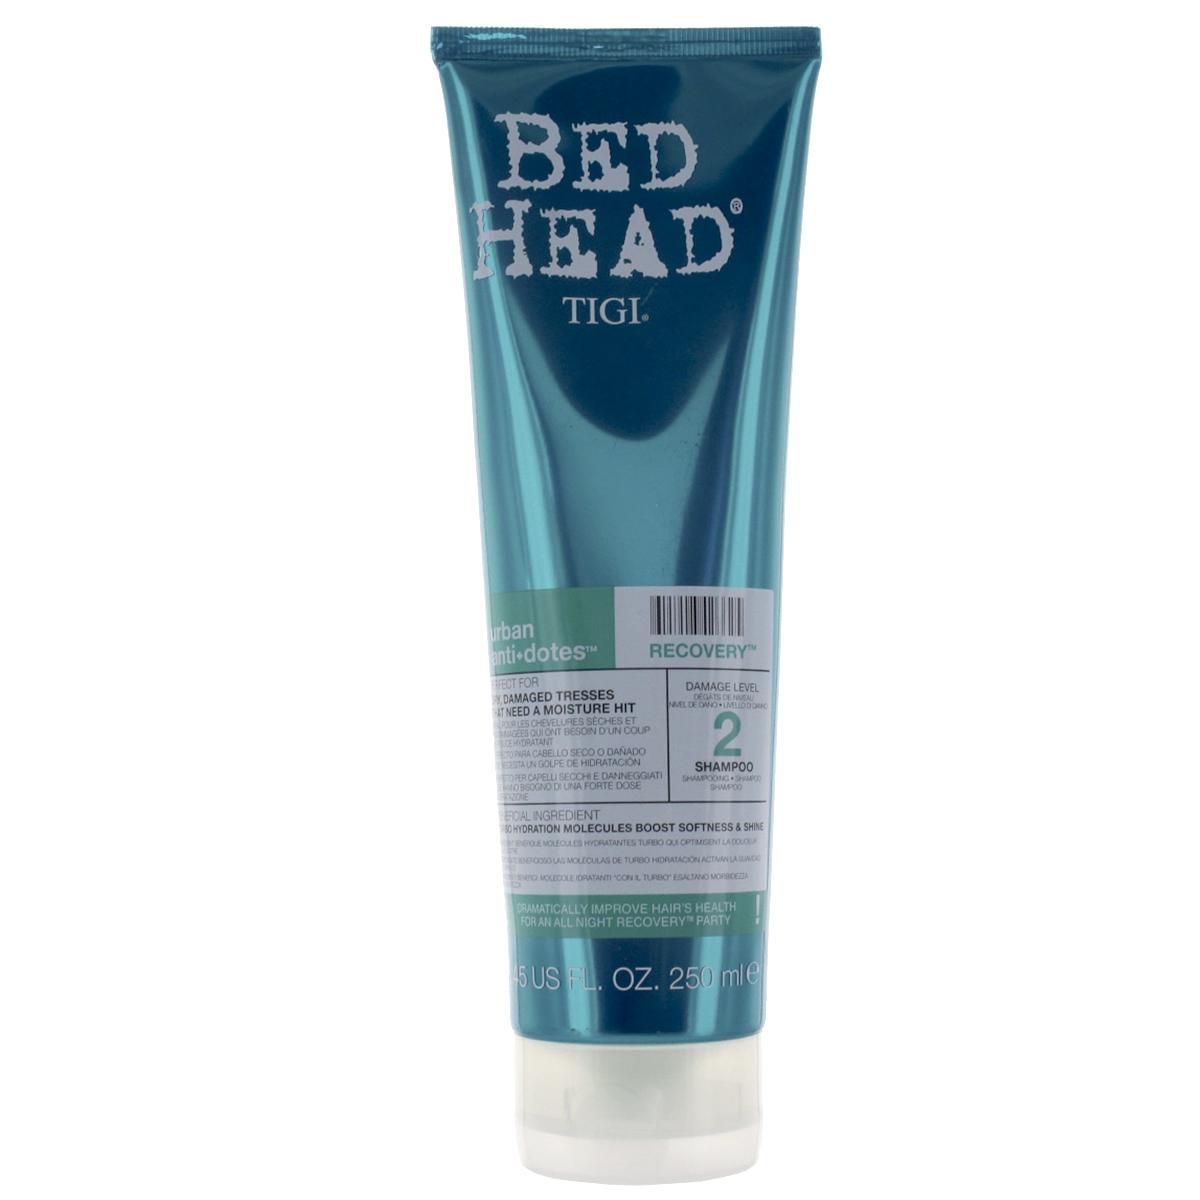 Shampoo Bed Head Urban Anti+dotes Recovery 250ml